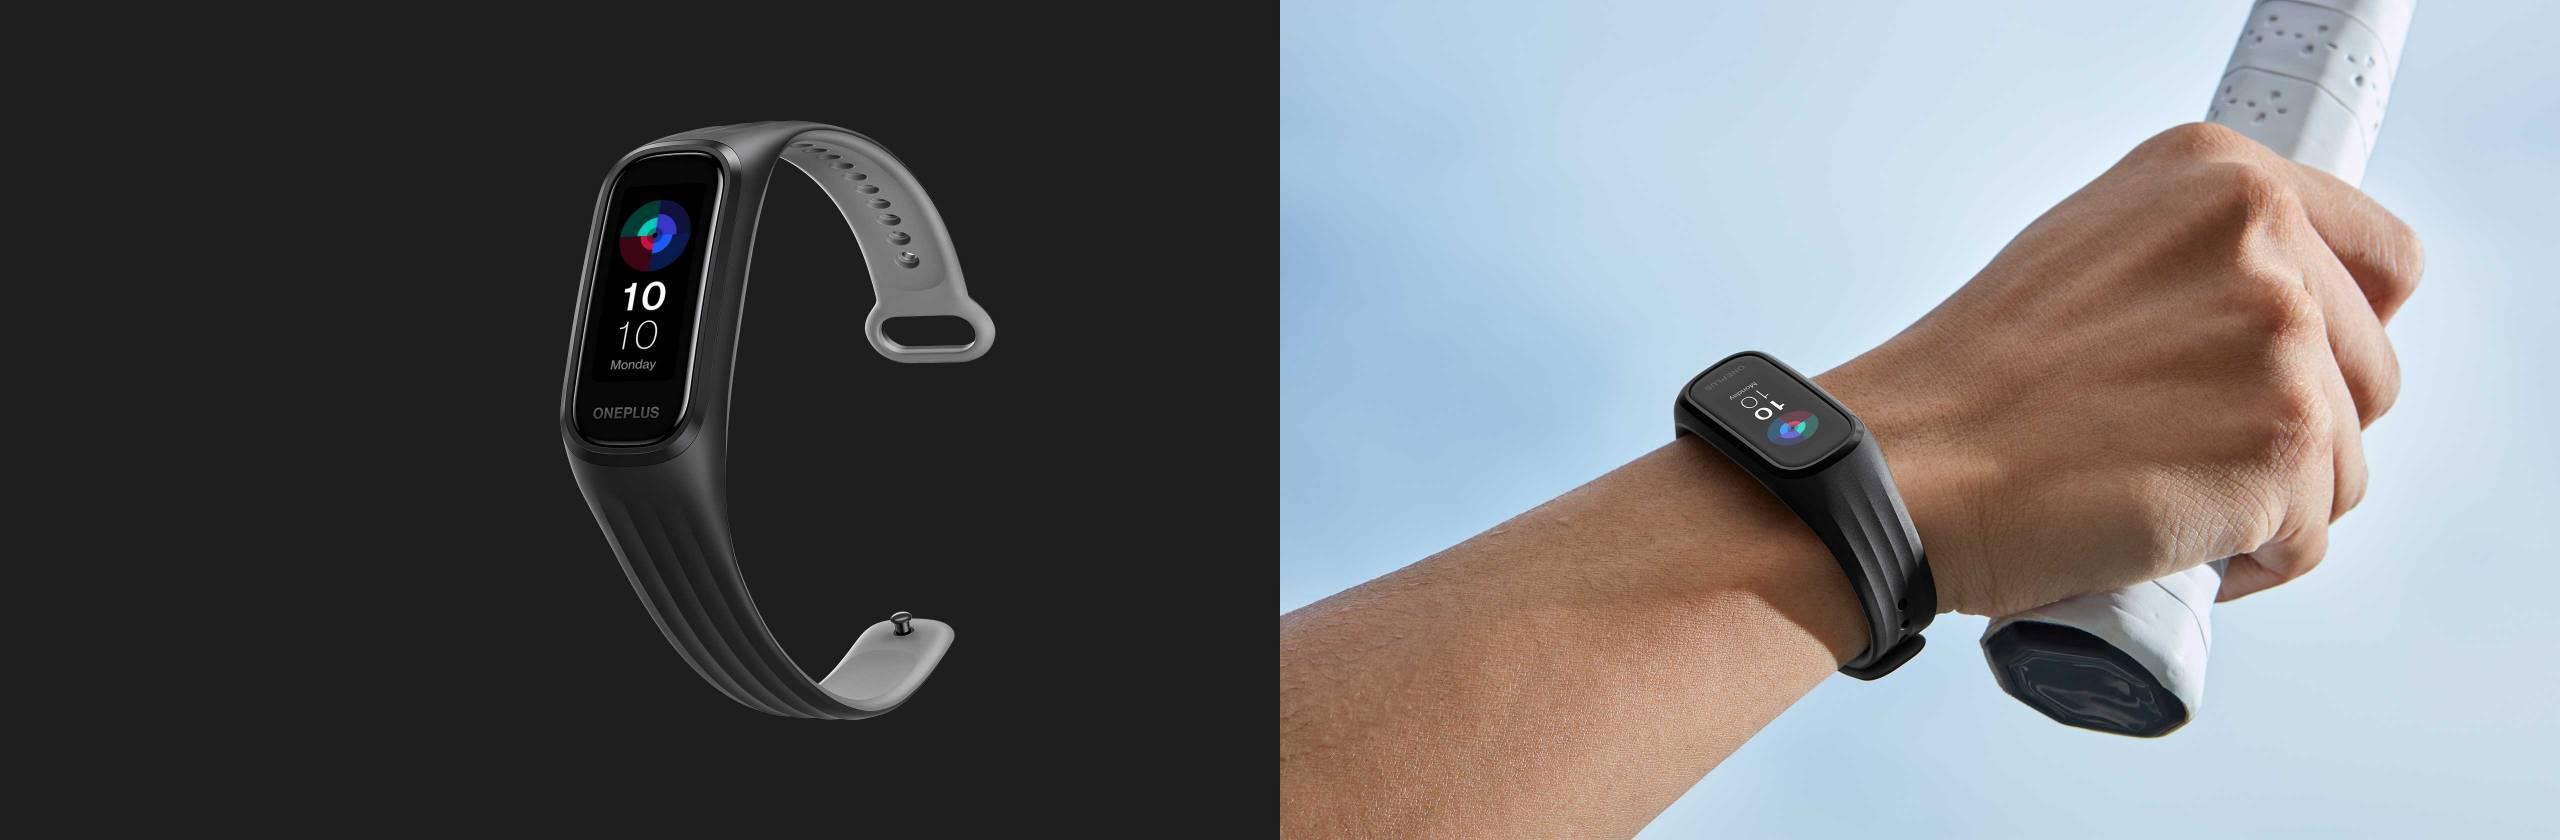 opaska OnePlus Band smart band